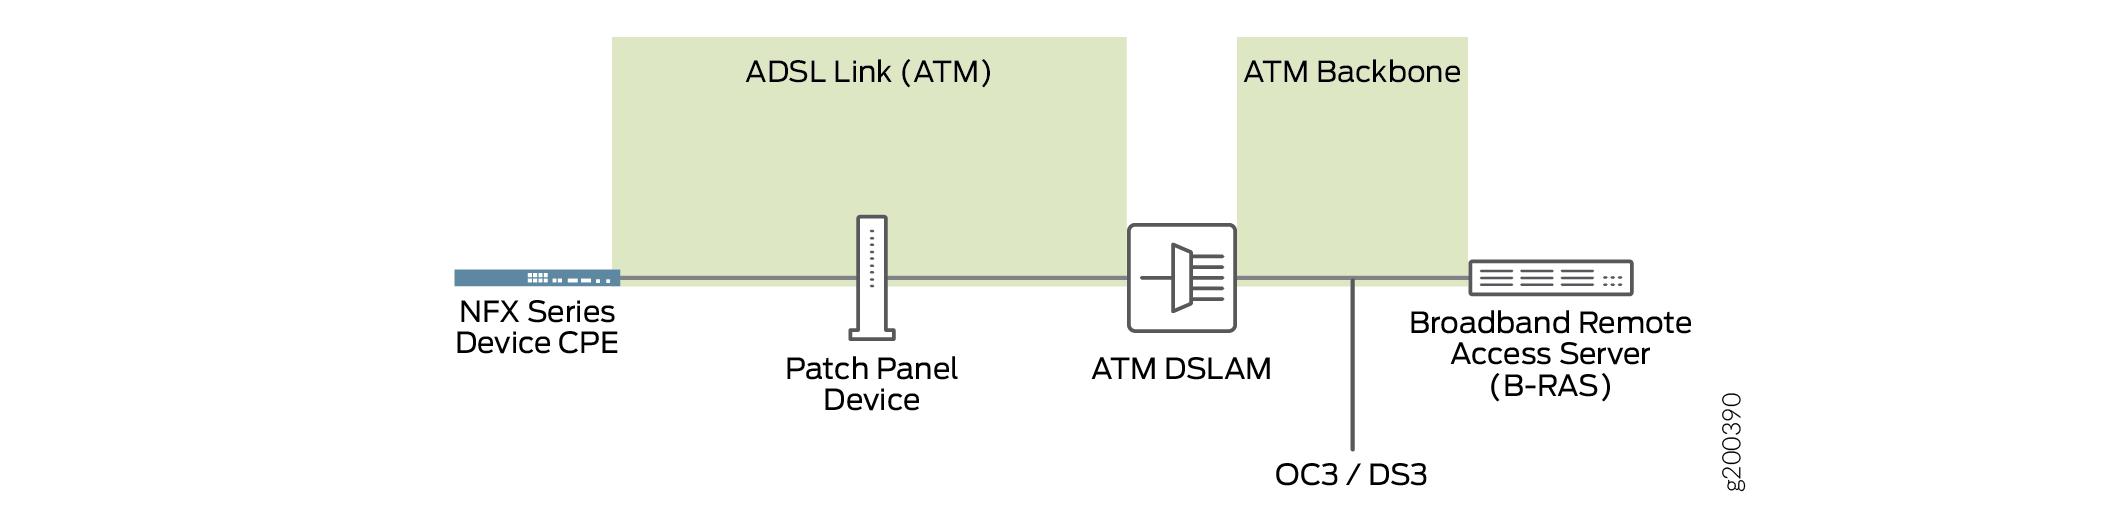 Backward-Compatible ADSL Topology (ATM DSLAM)